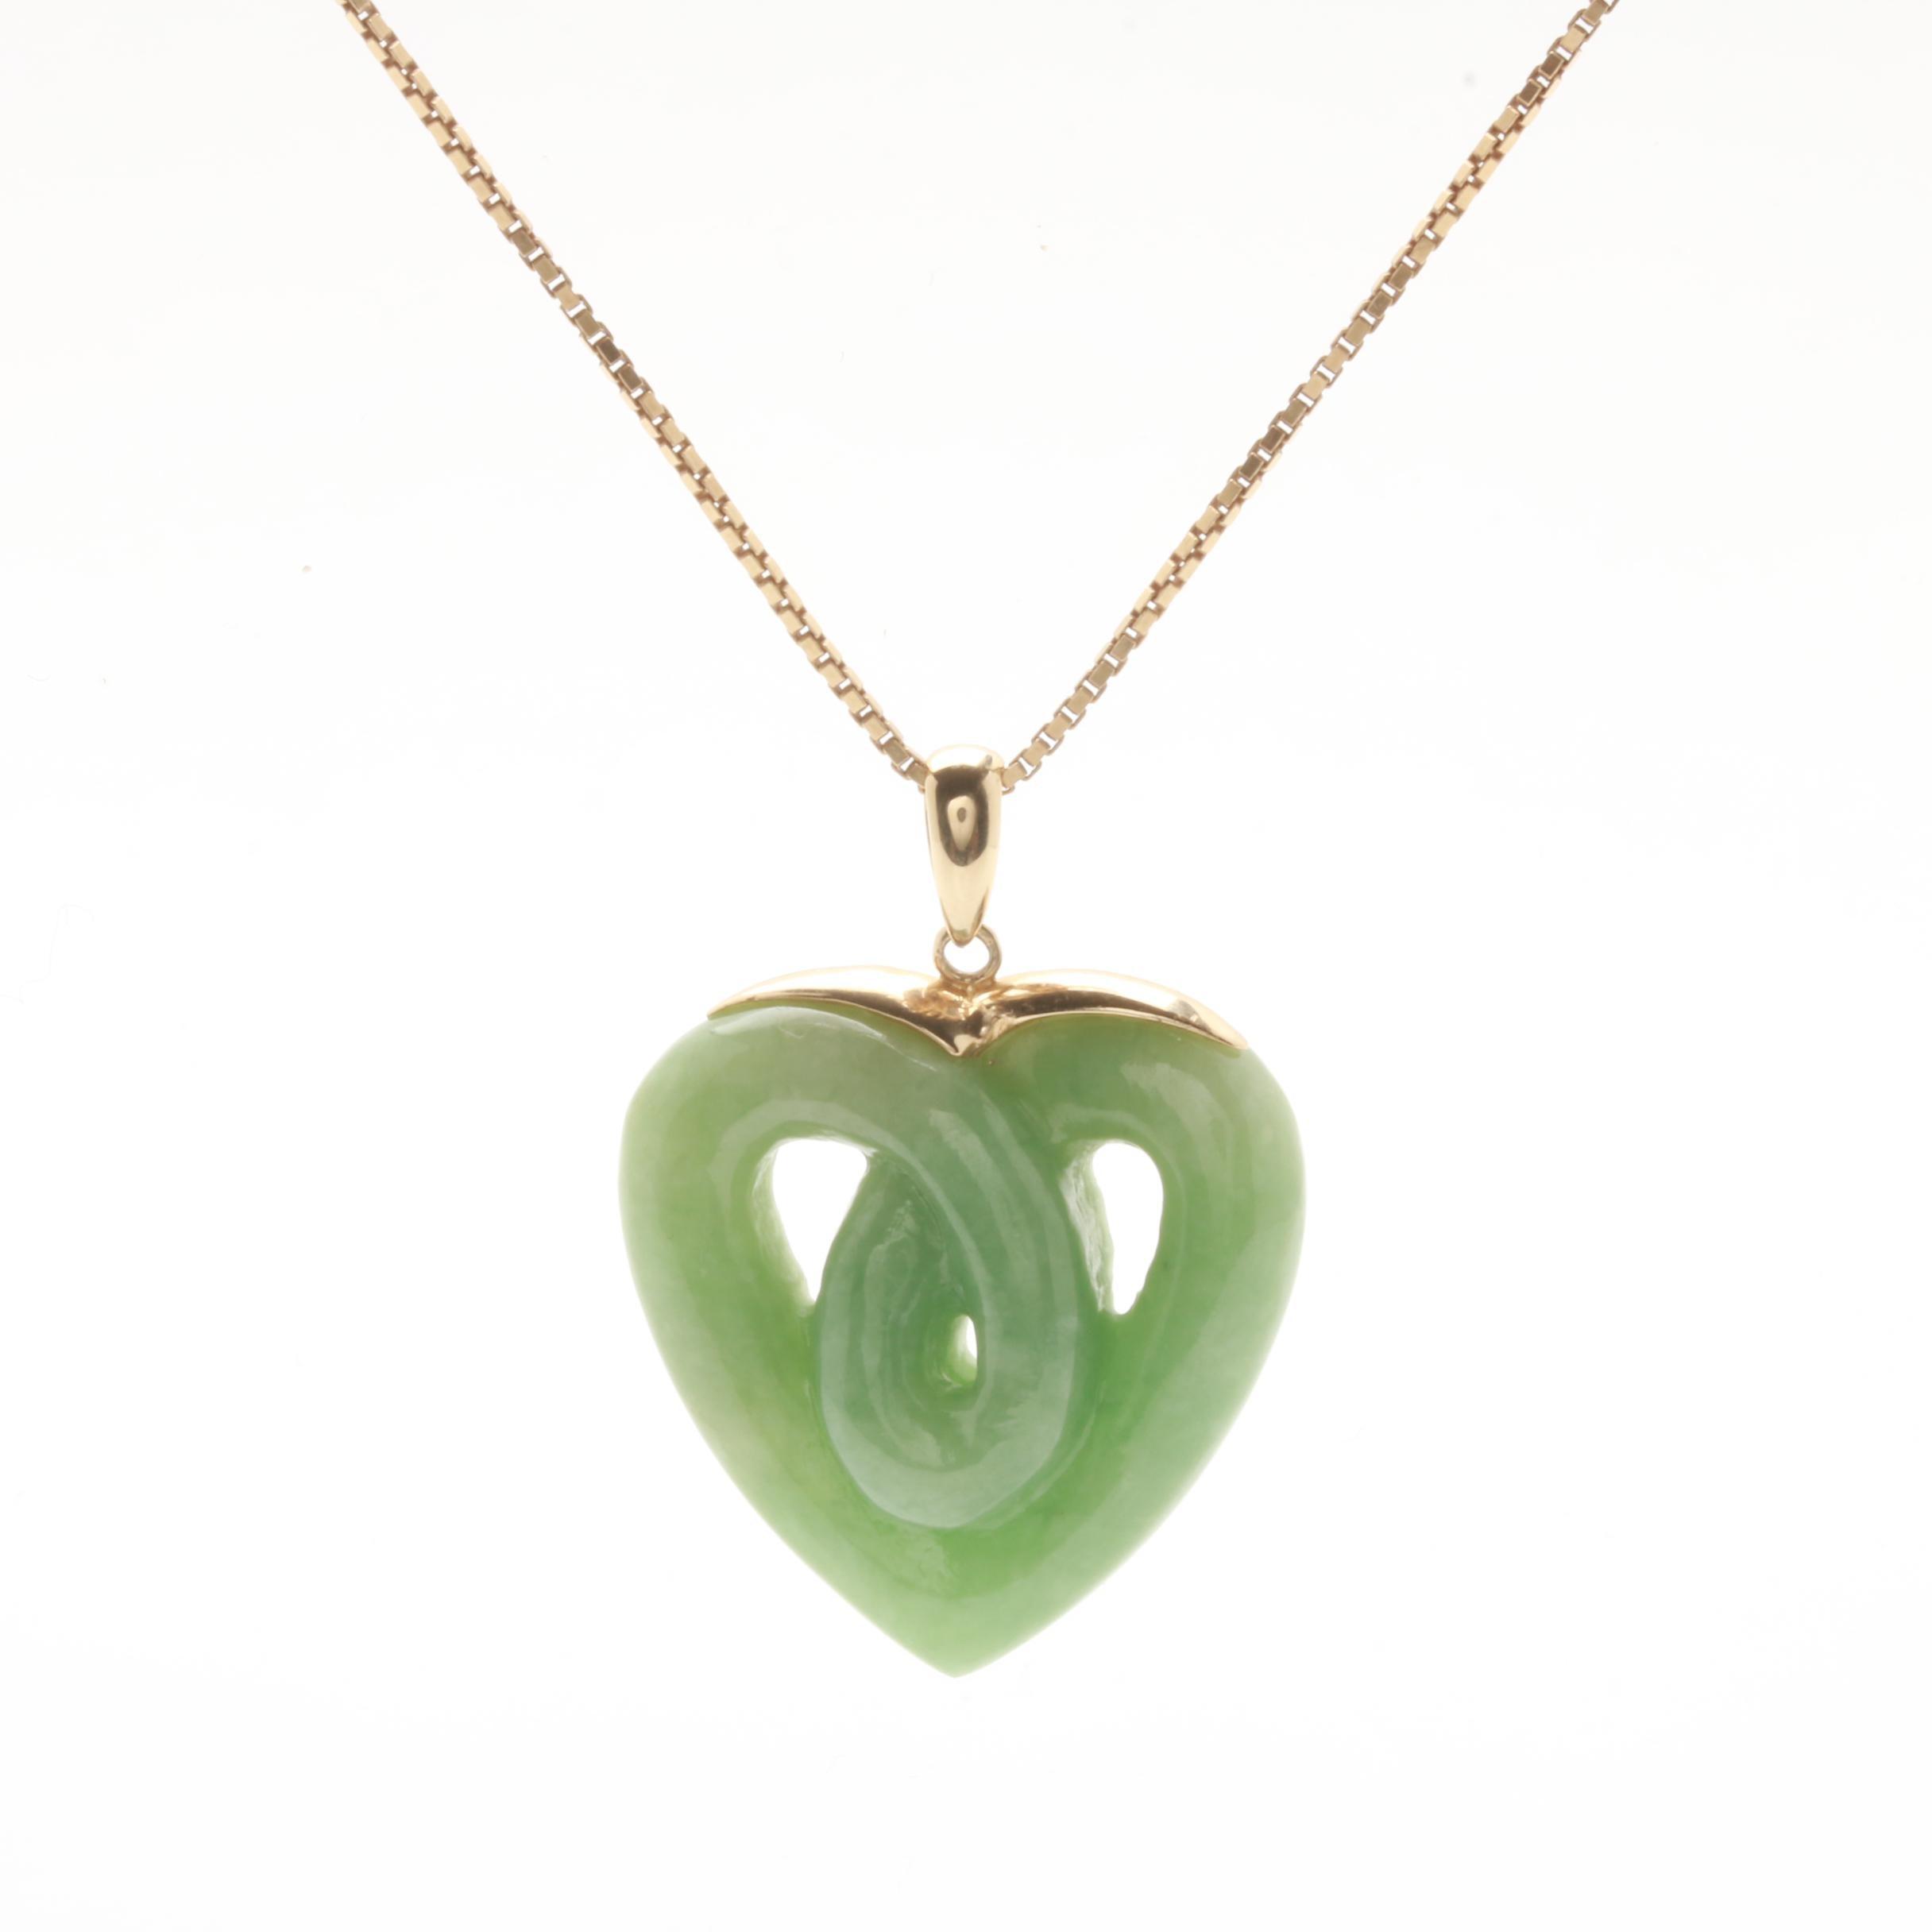 14K Yellow Gold Jadeite Heart Pendant Necklace